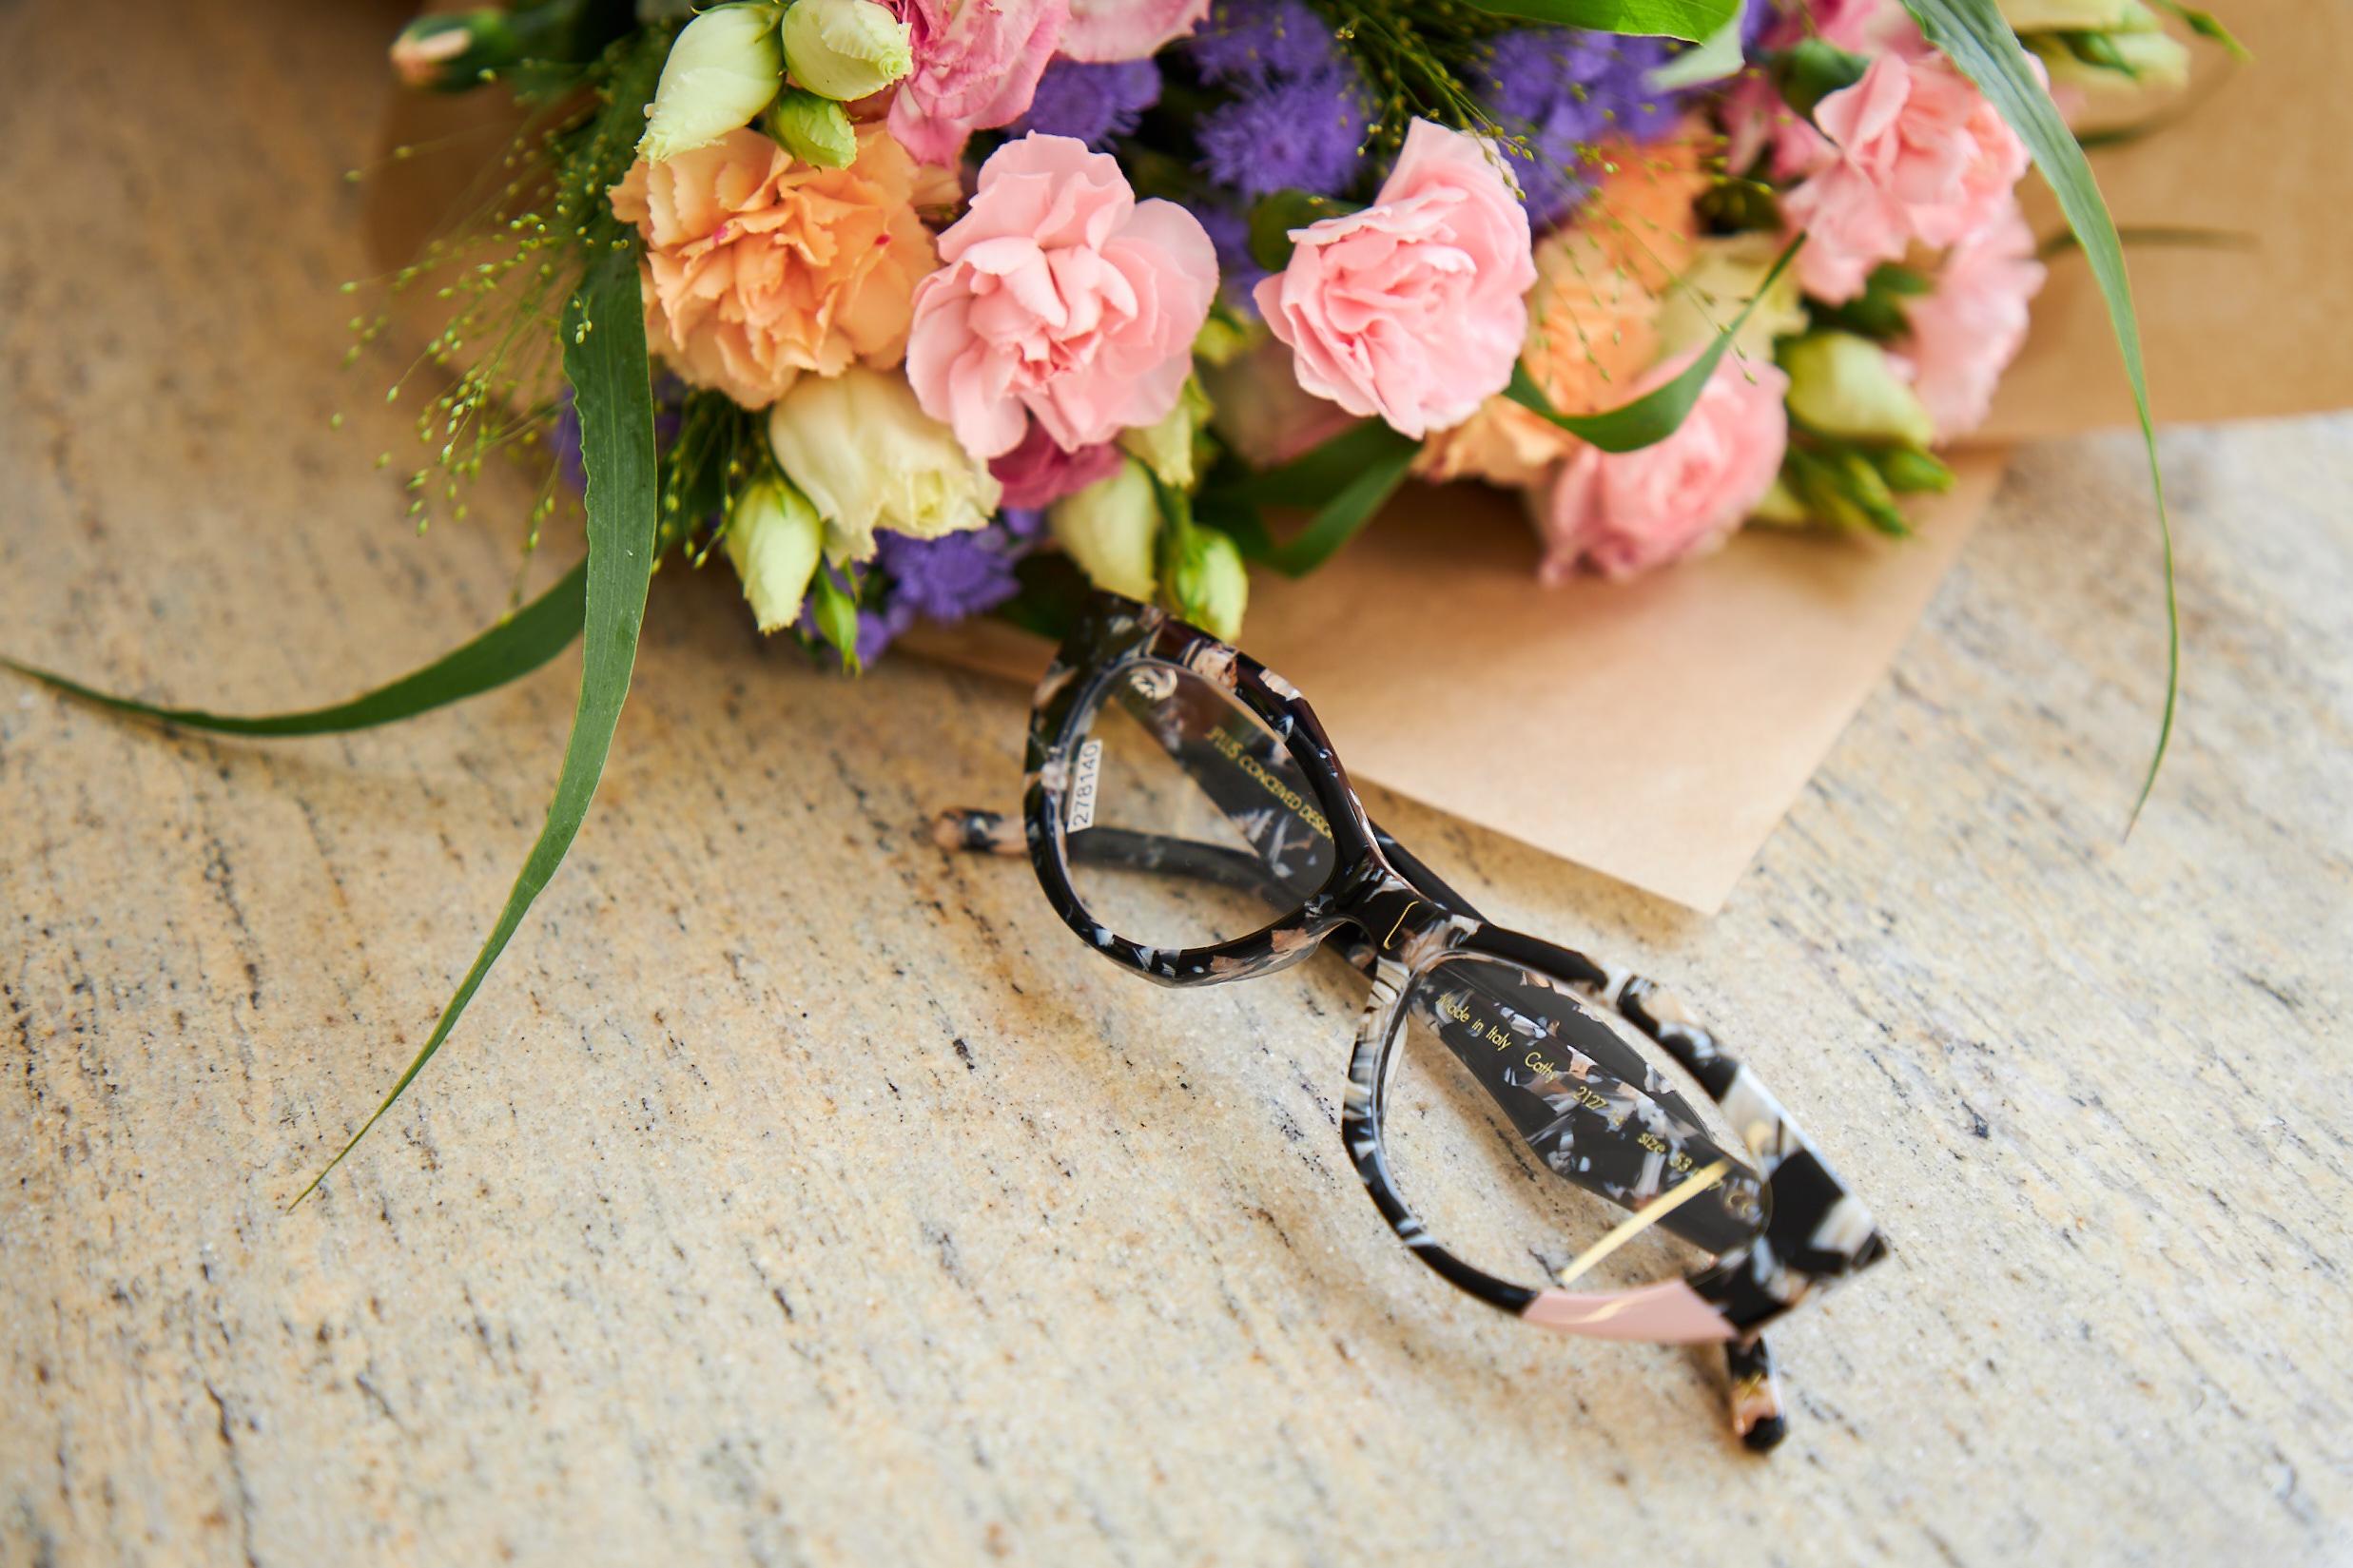 Okulary korekcyjne i kwiaty